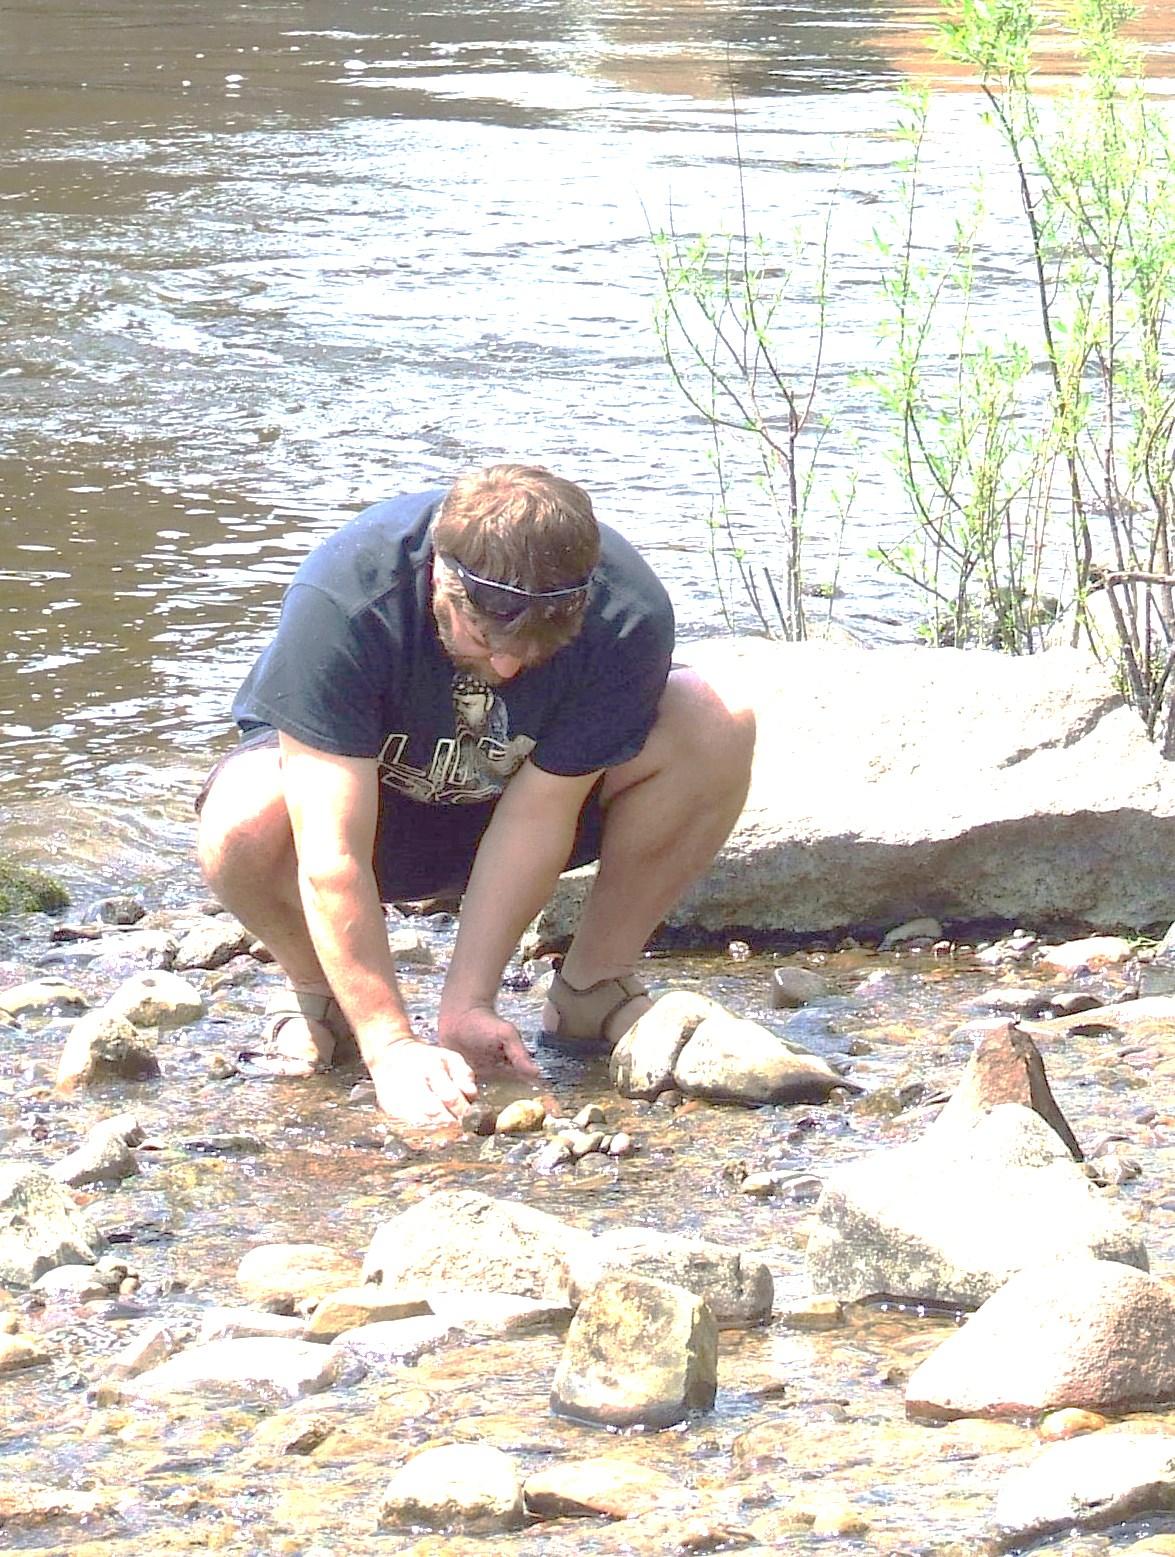 Rare Fairy Cross stones found in Little Falls